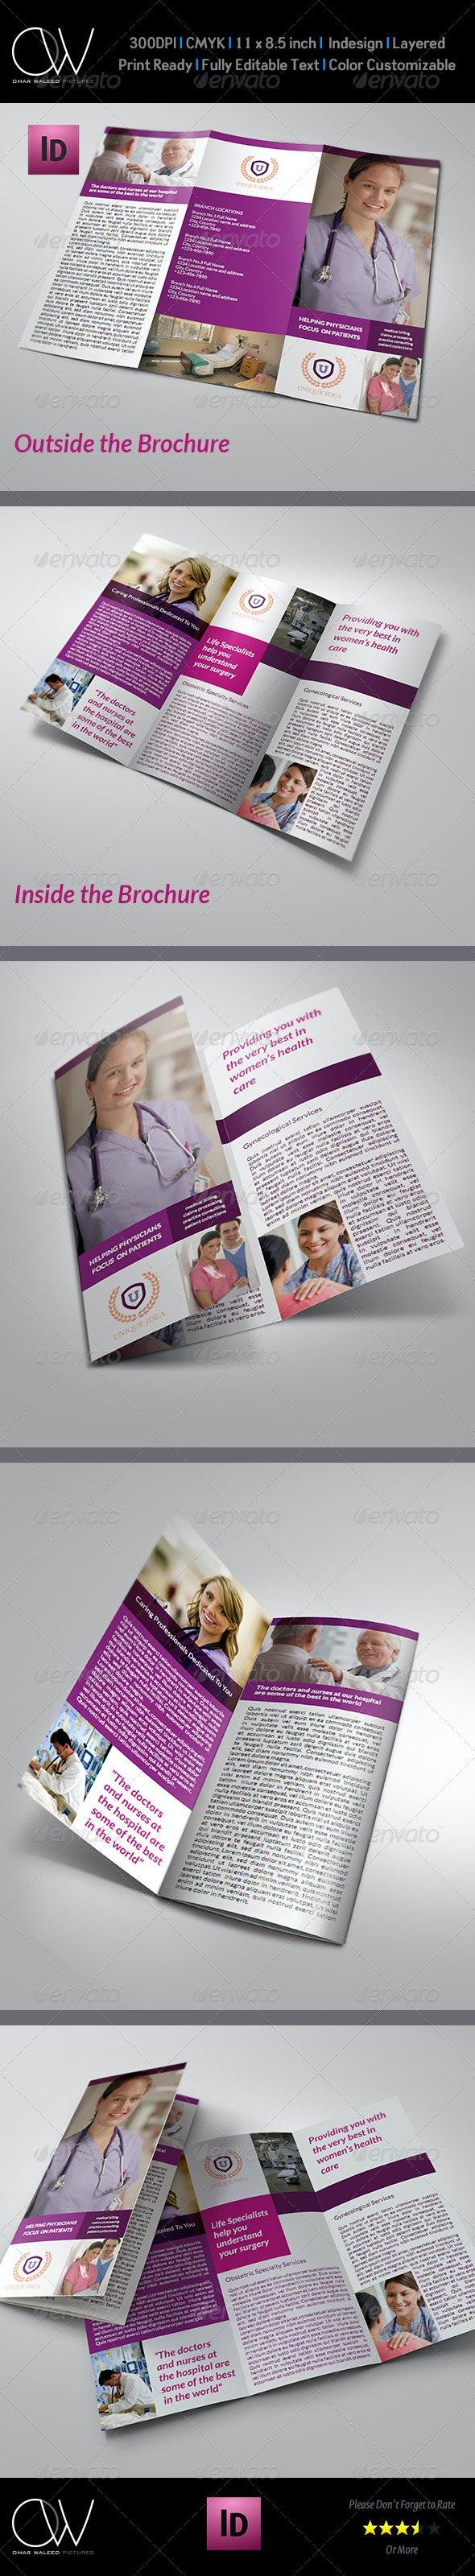 Hospital Tri-Fold Brochure Template - Brochures Print Templates